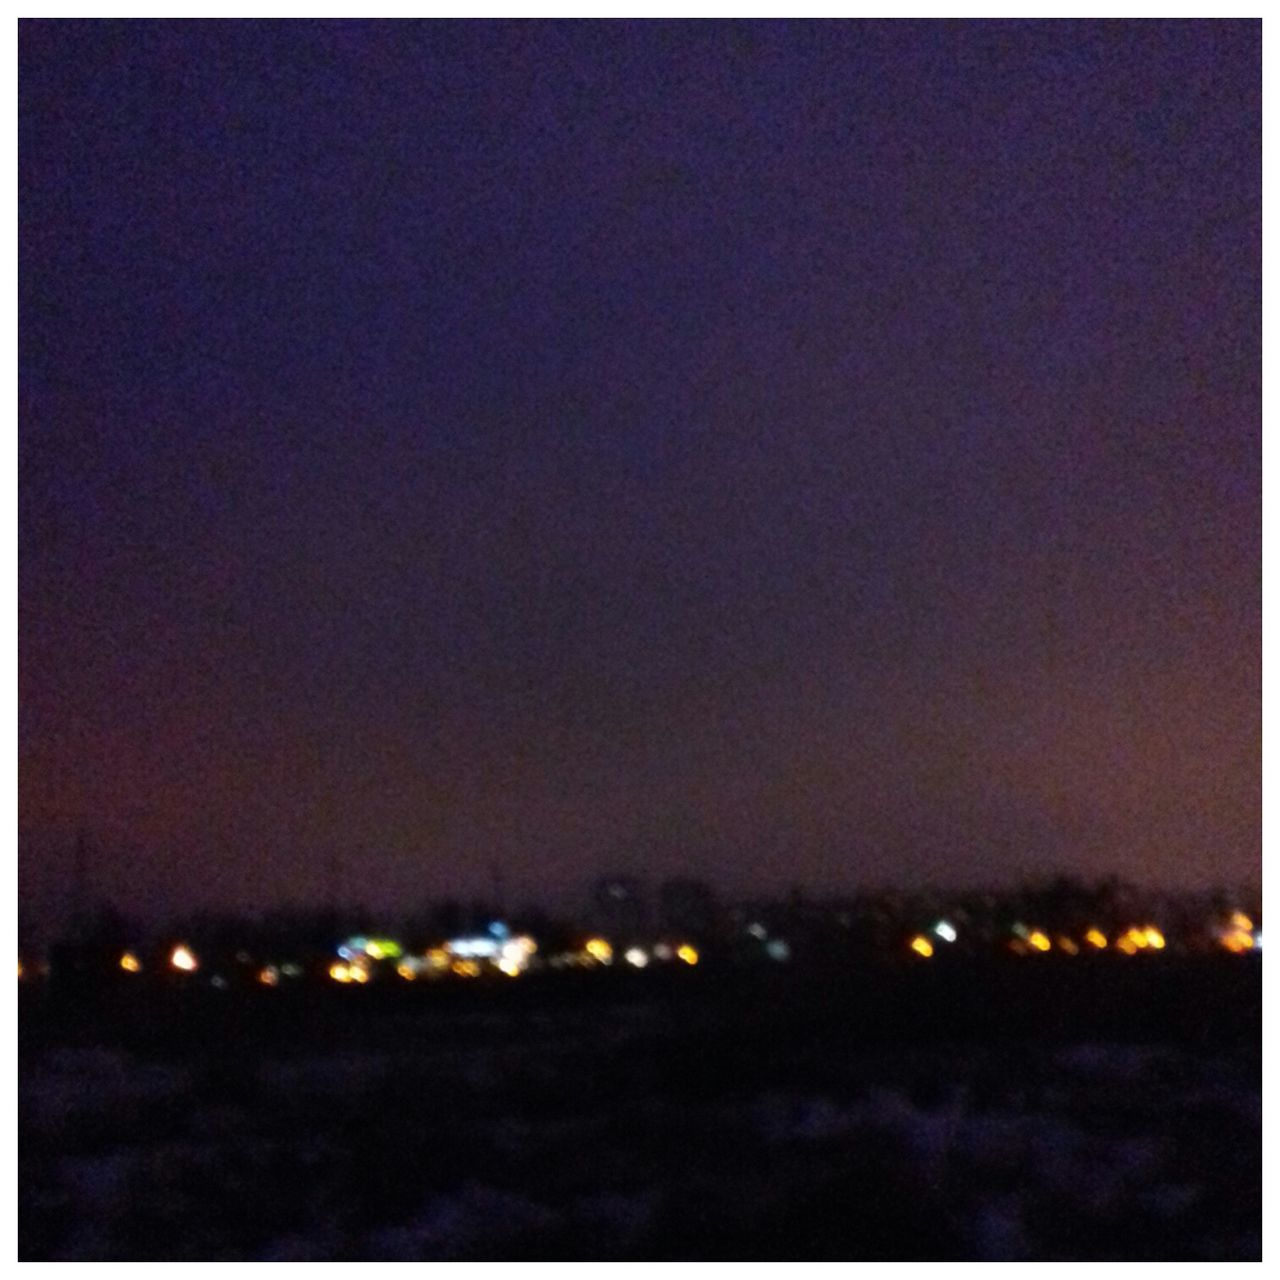 night, illuminated, sky, no people, outdoors, city, water, nature, cityscape